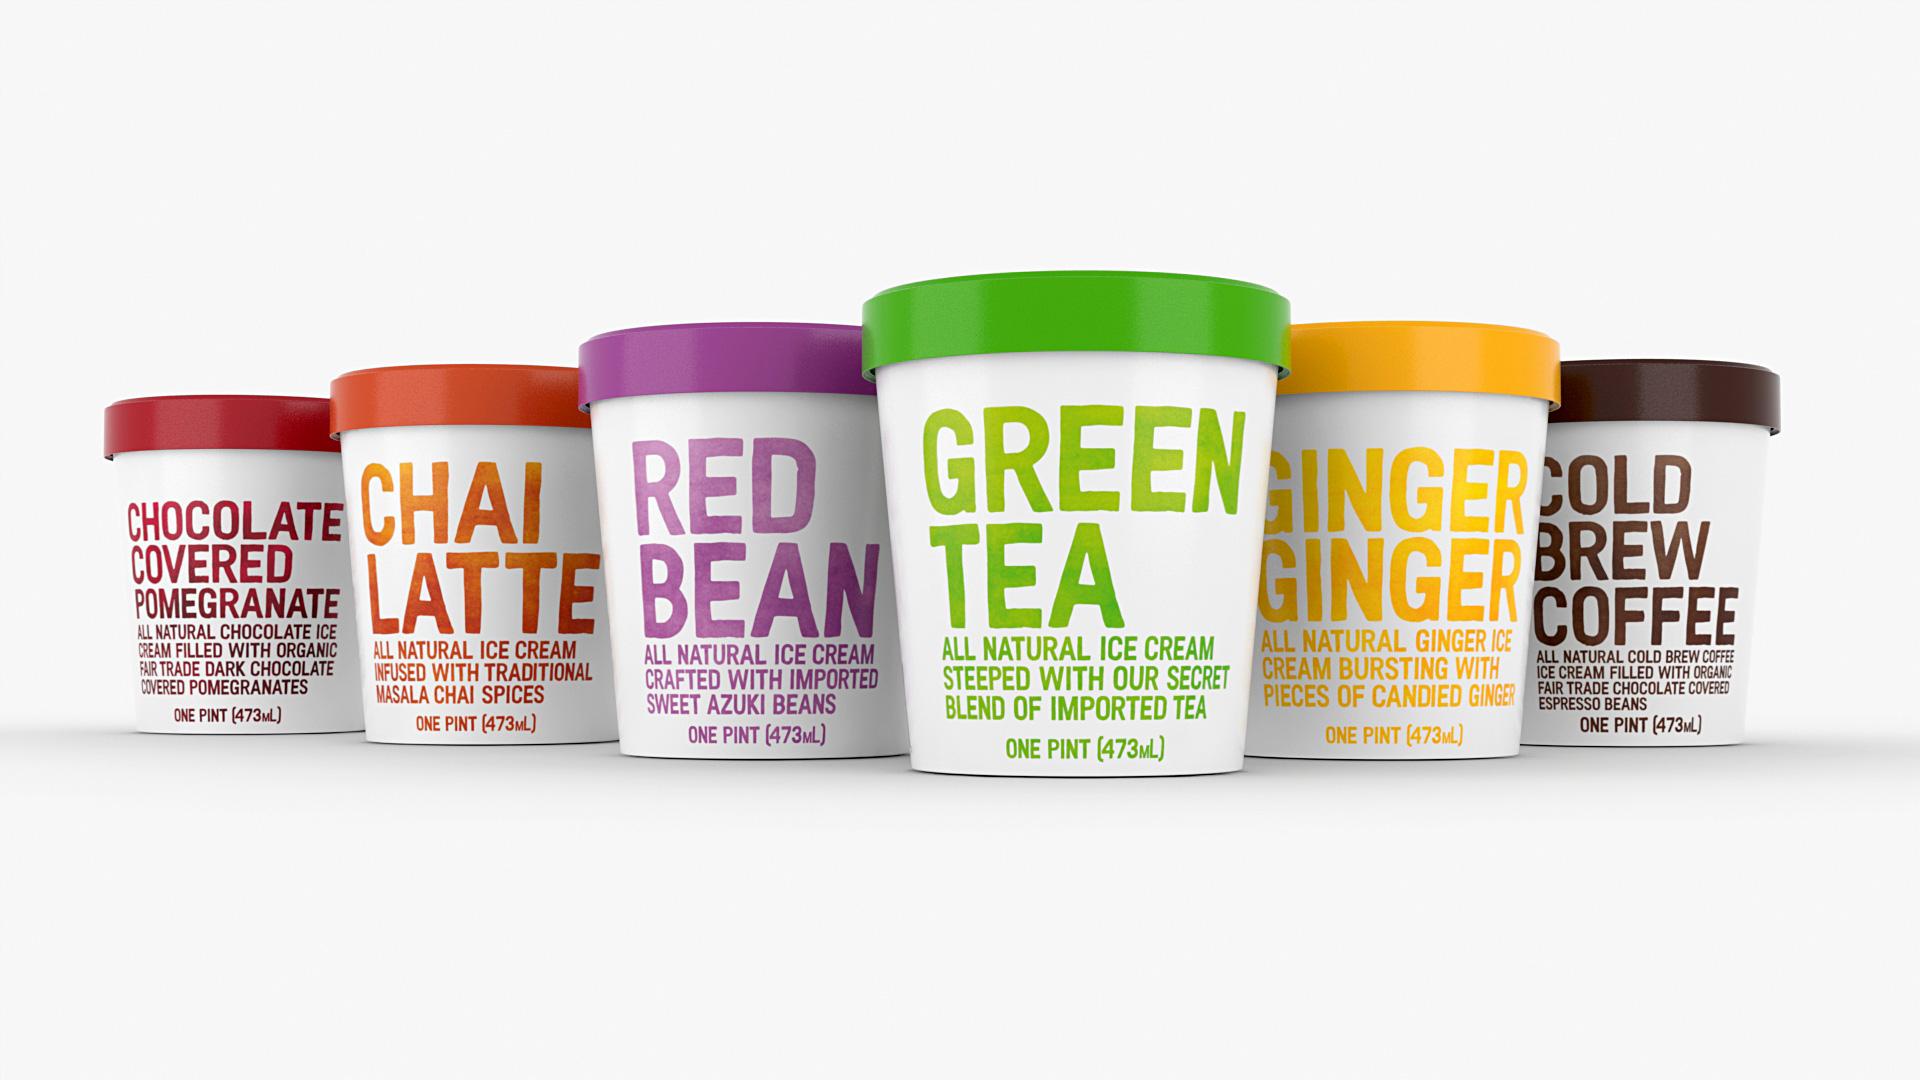 Mr Green Tea